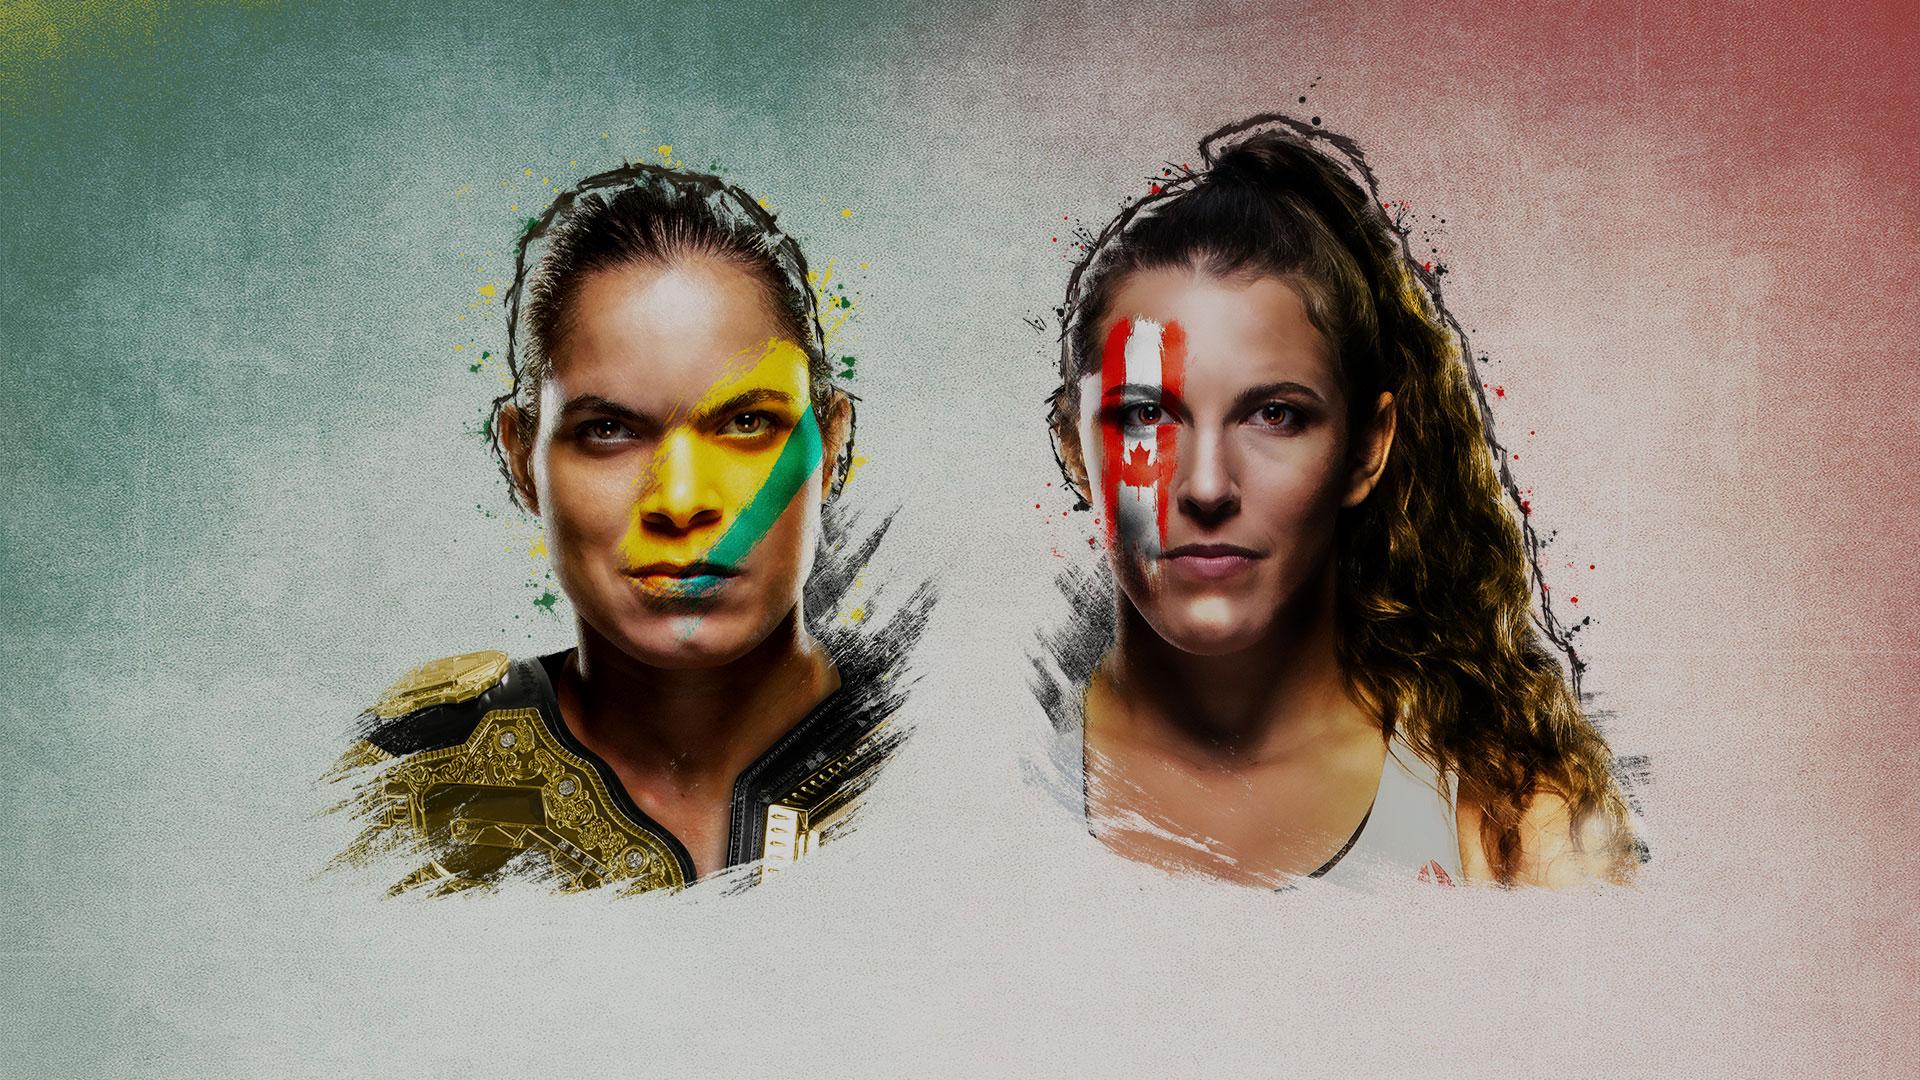 UFC 250 Nunes vs Spencer Promotional Image